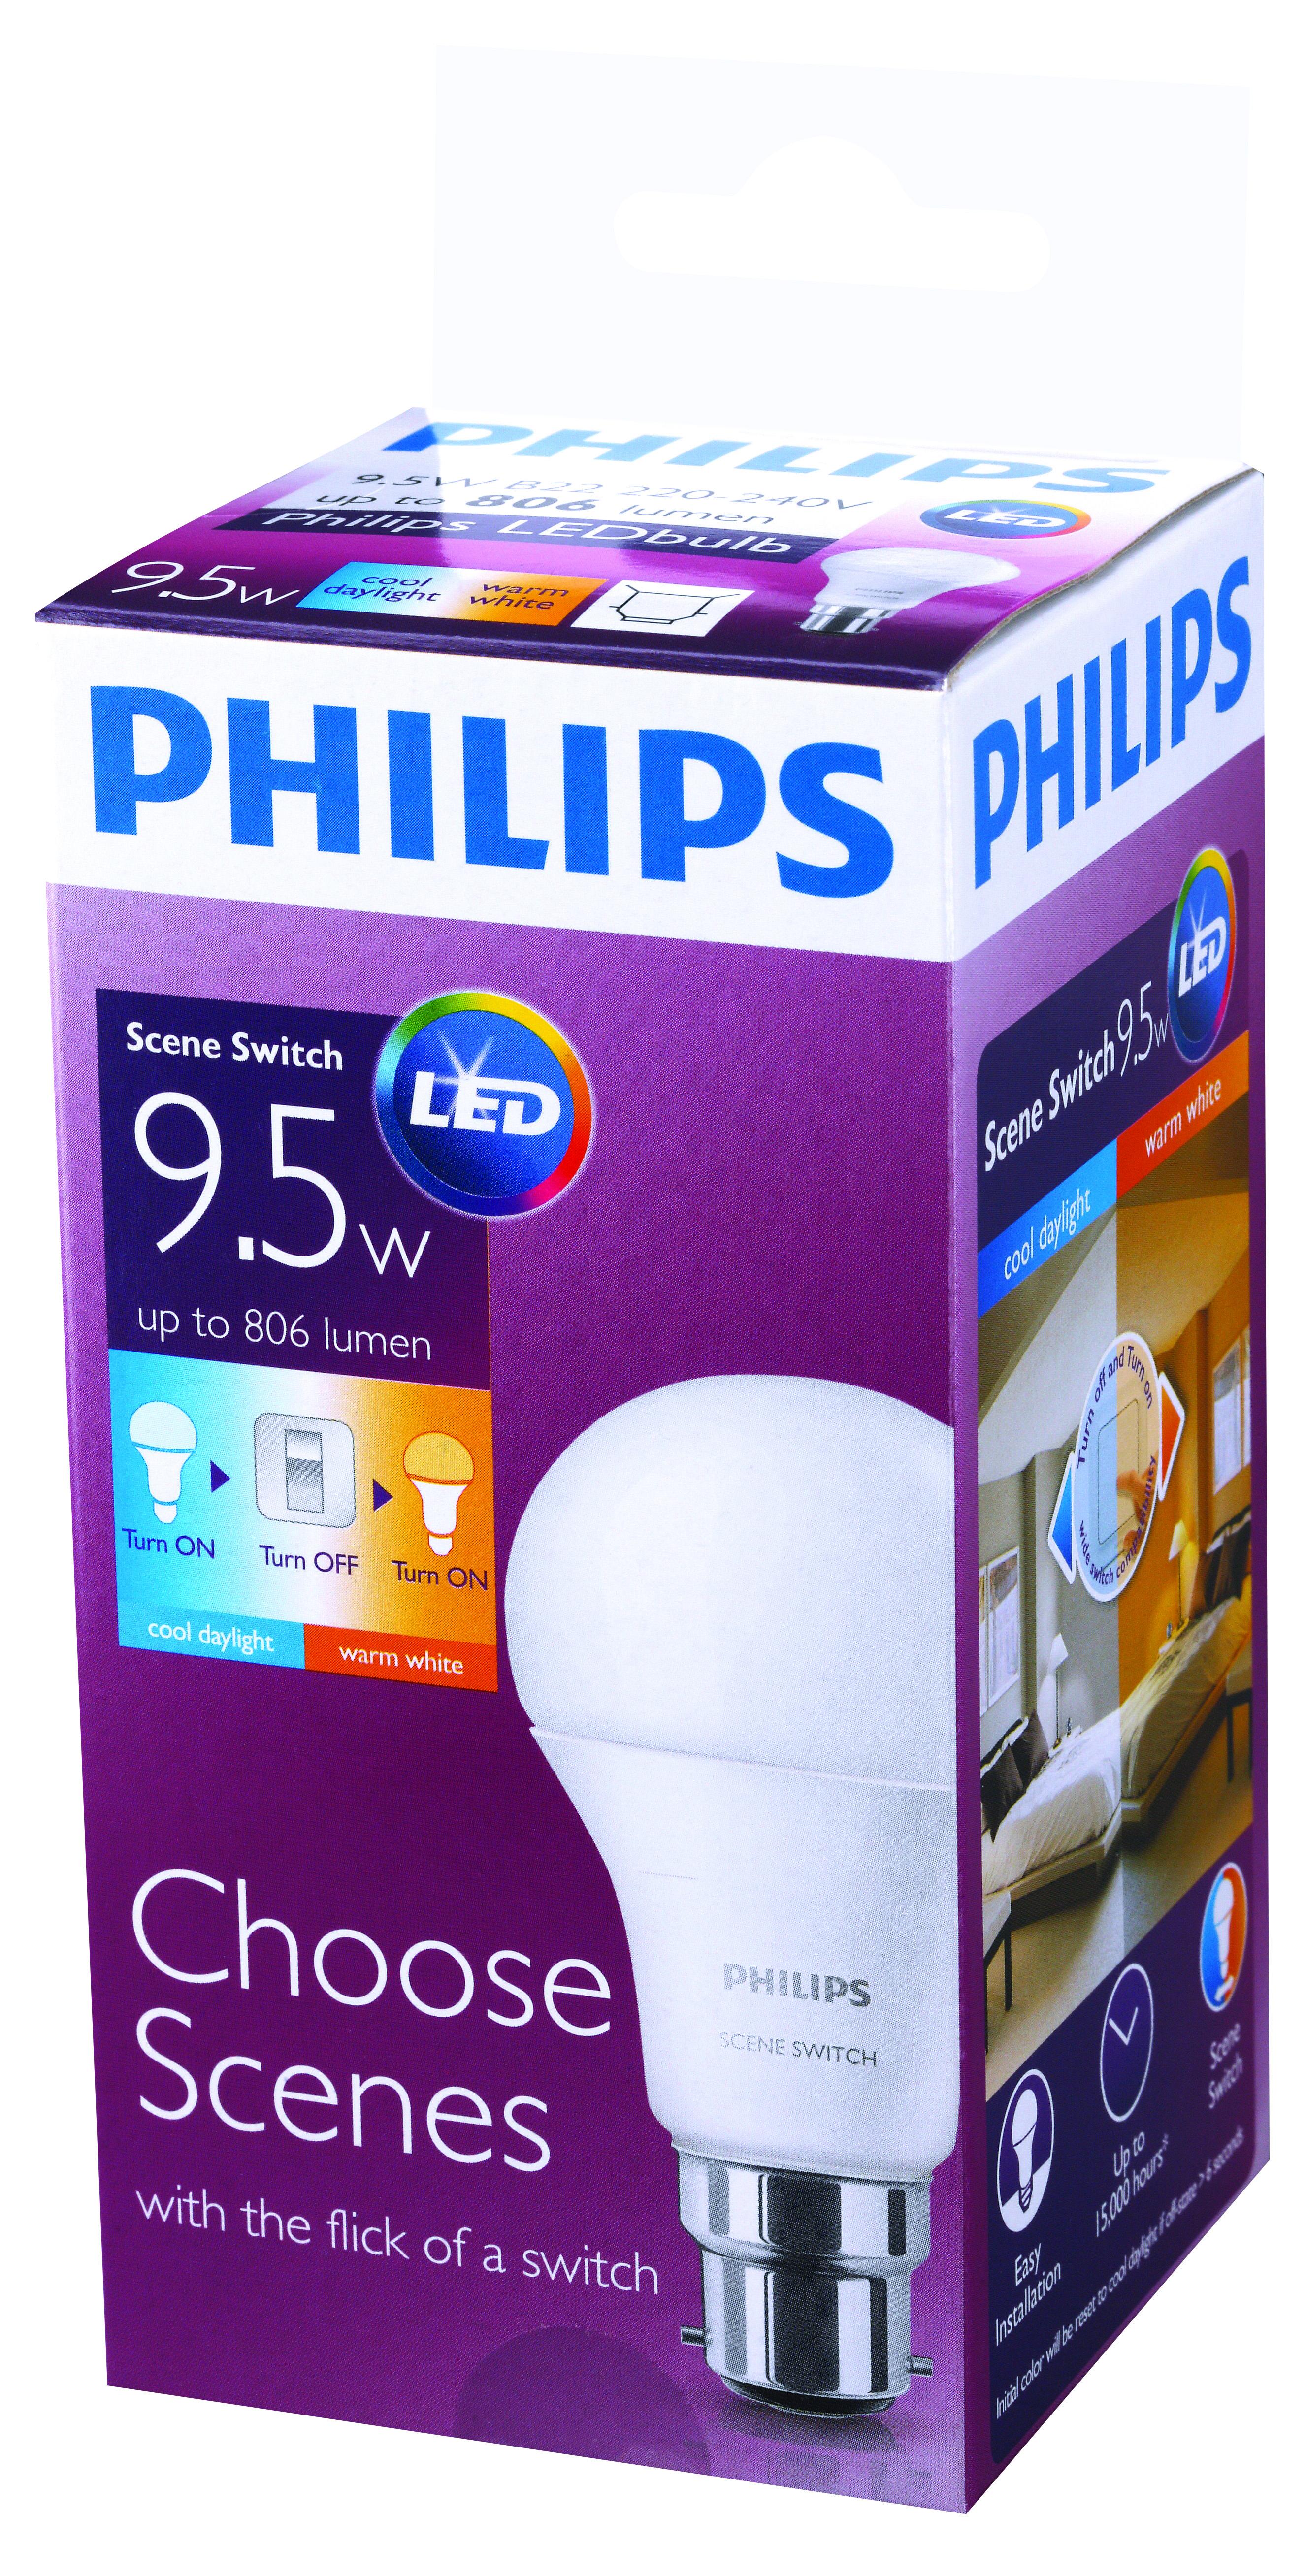 Philips Scene Switch 2 in 1 LED Bulb Australian Hardware